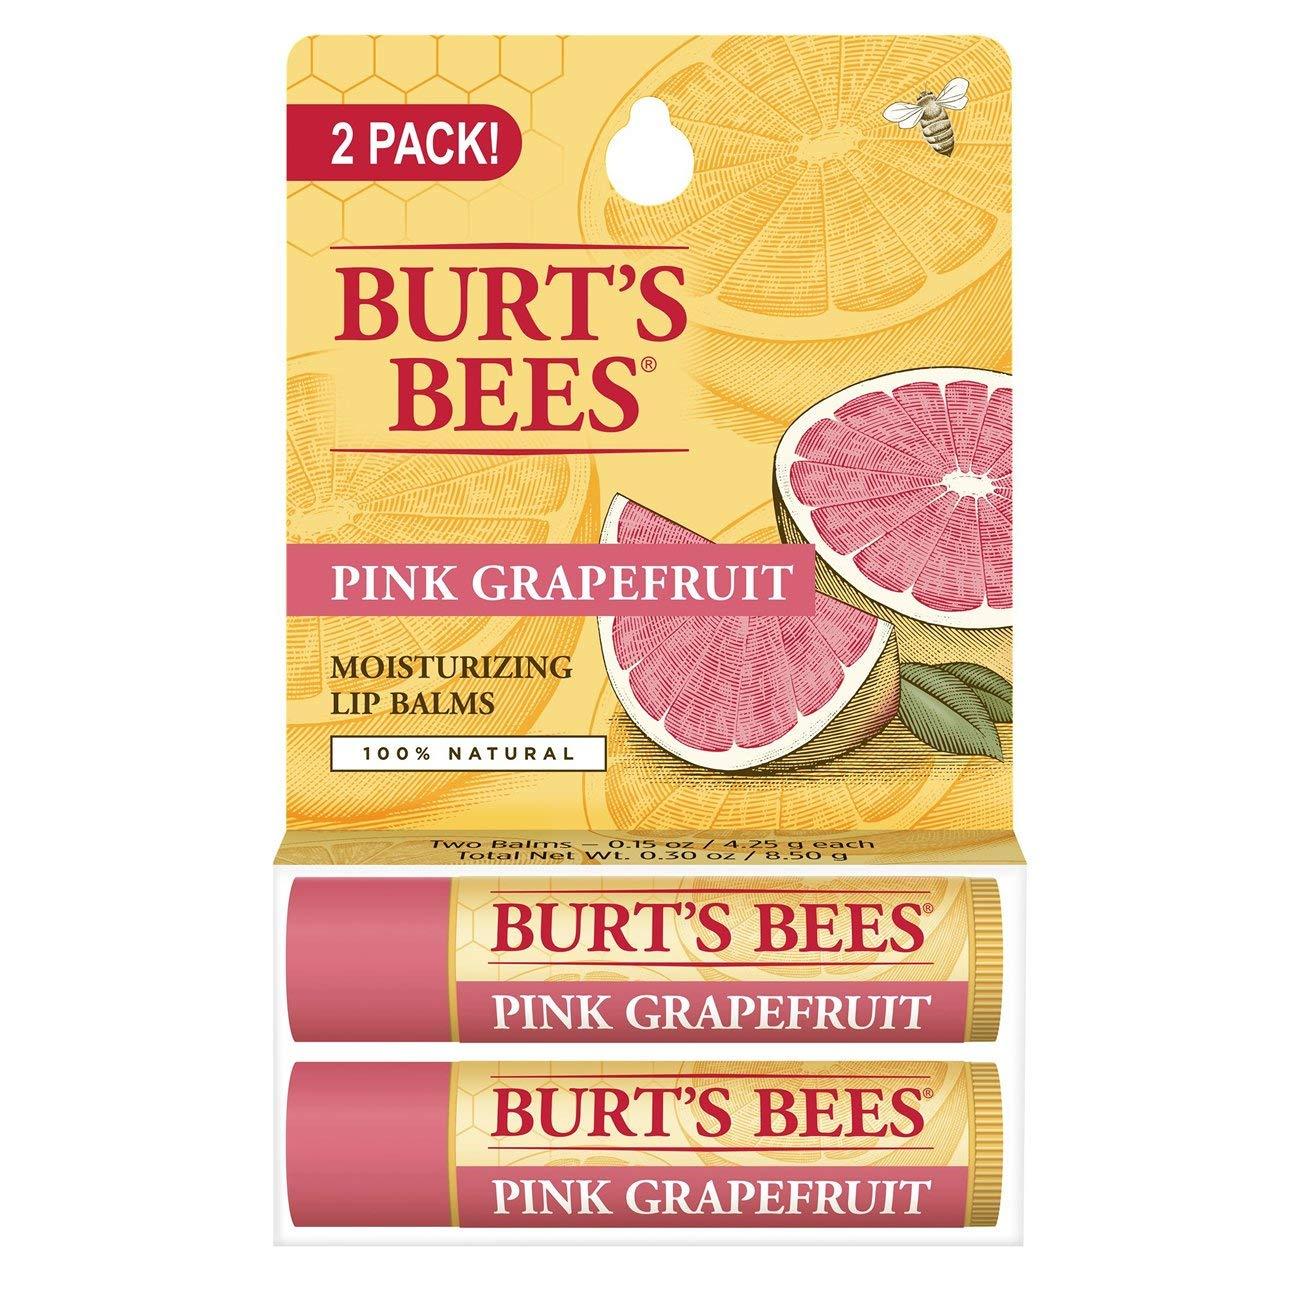 Add on item $2.99 Burt's Bees 100% Natural Moisturizing Lip Balm, Pink Grapefruit, 2 Tubes in Blister Box @ Amazon